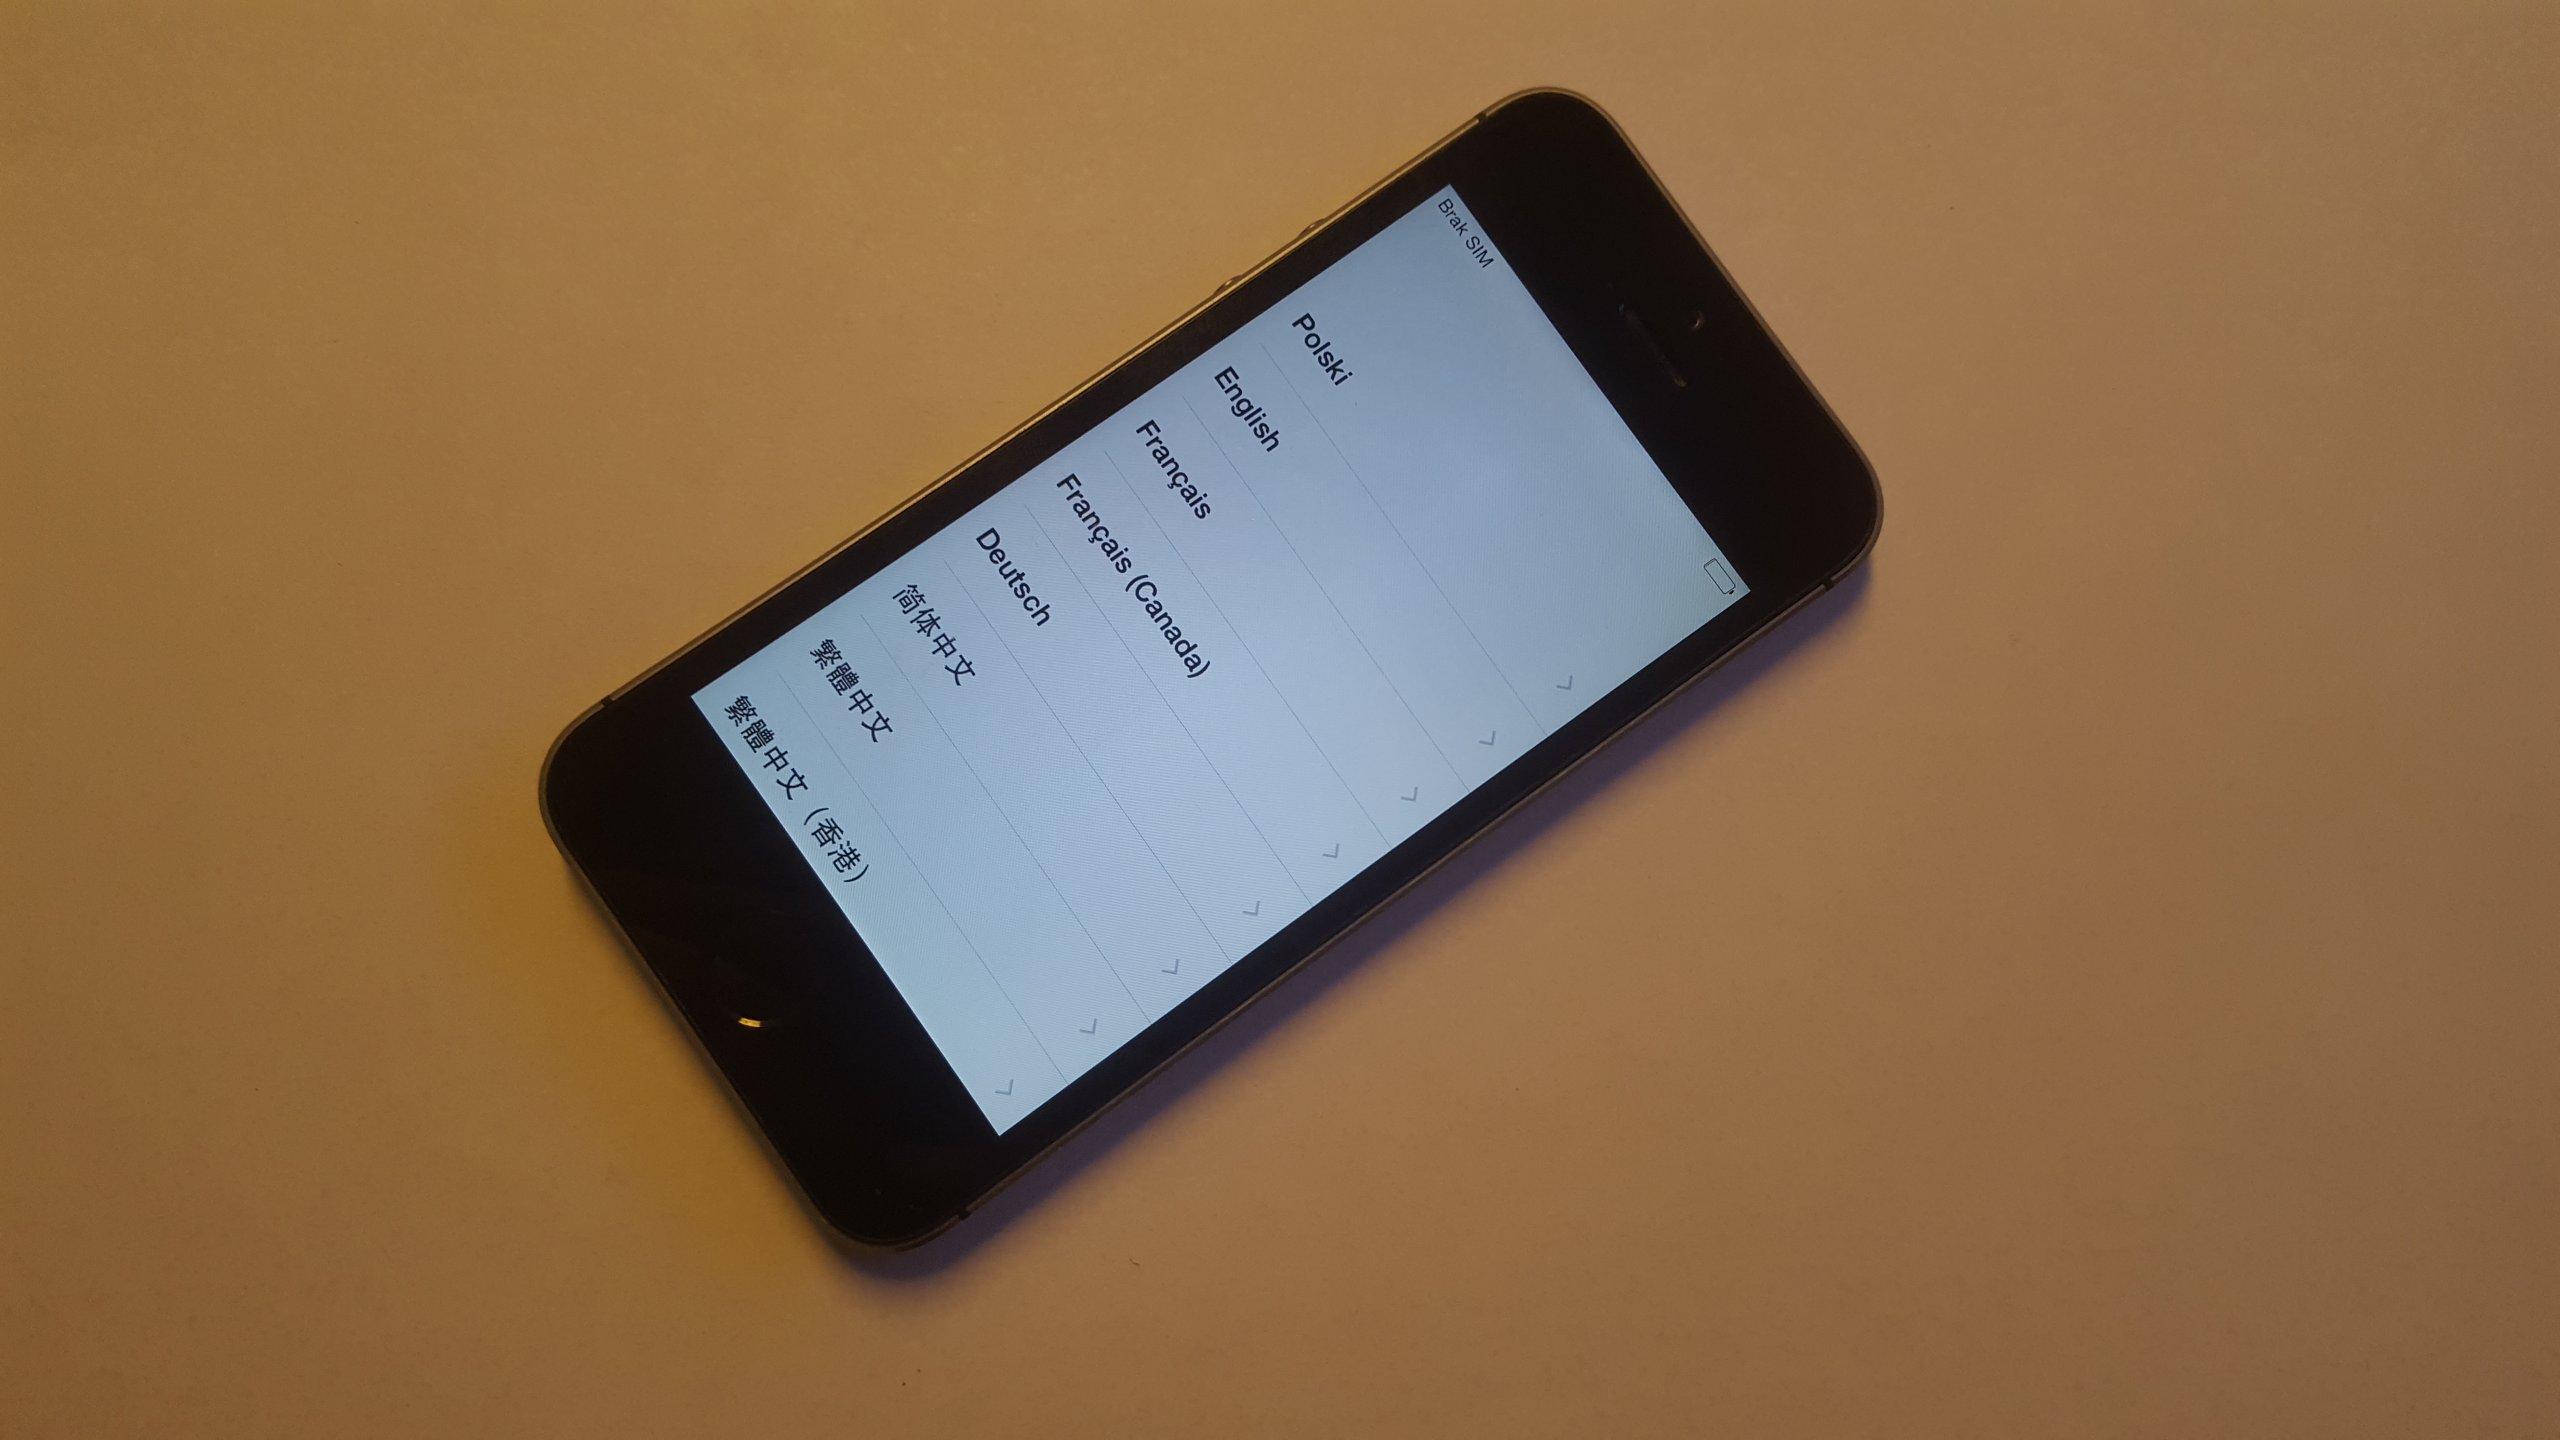 iphone5s mp4分辨率_iPhone 5S 16GB A1457 ICLOUD 100% SPRAWNY FAKTURA - 7040456208 - oficjalne archiwum Allegro